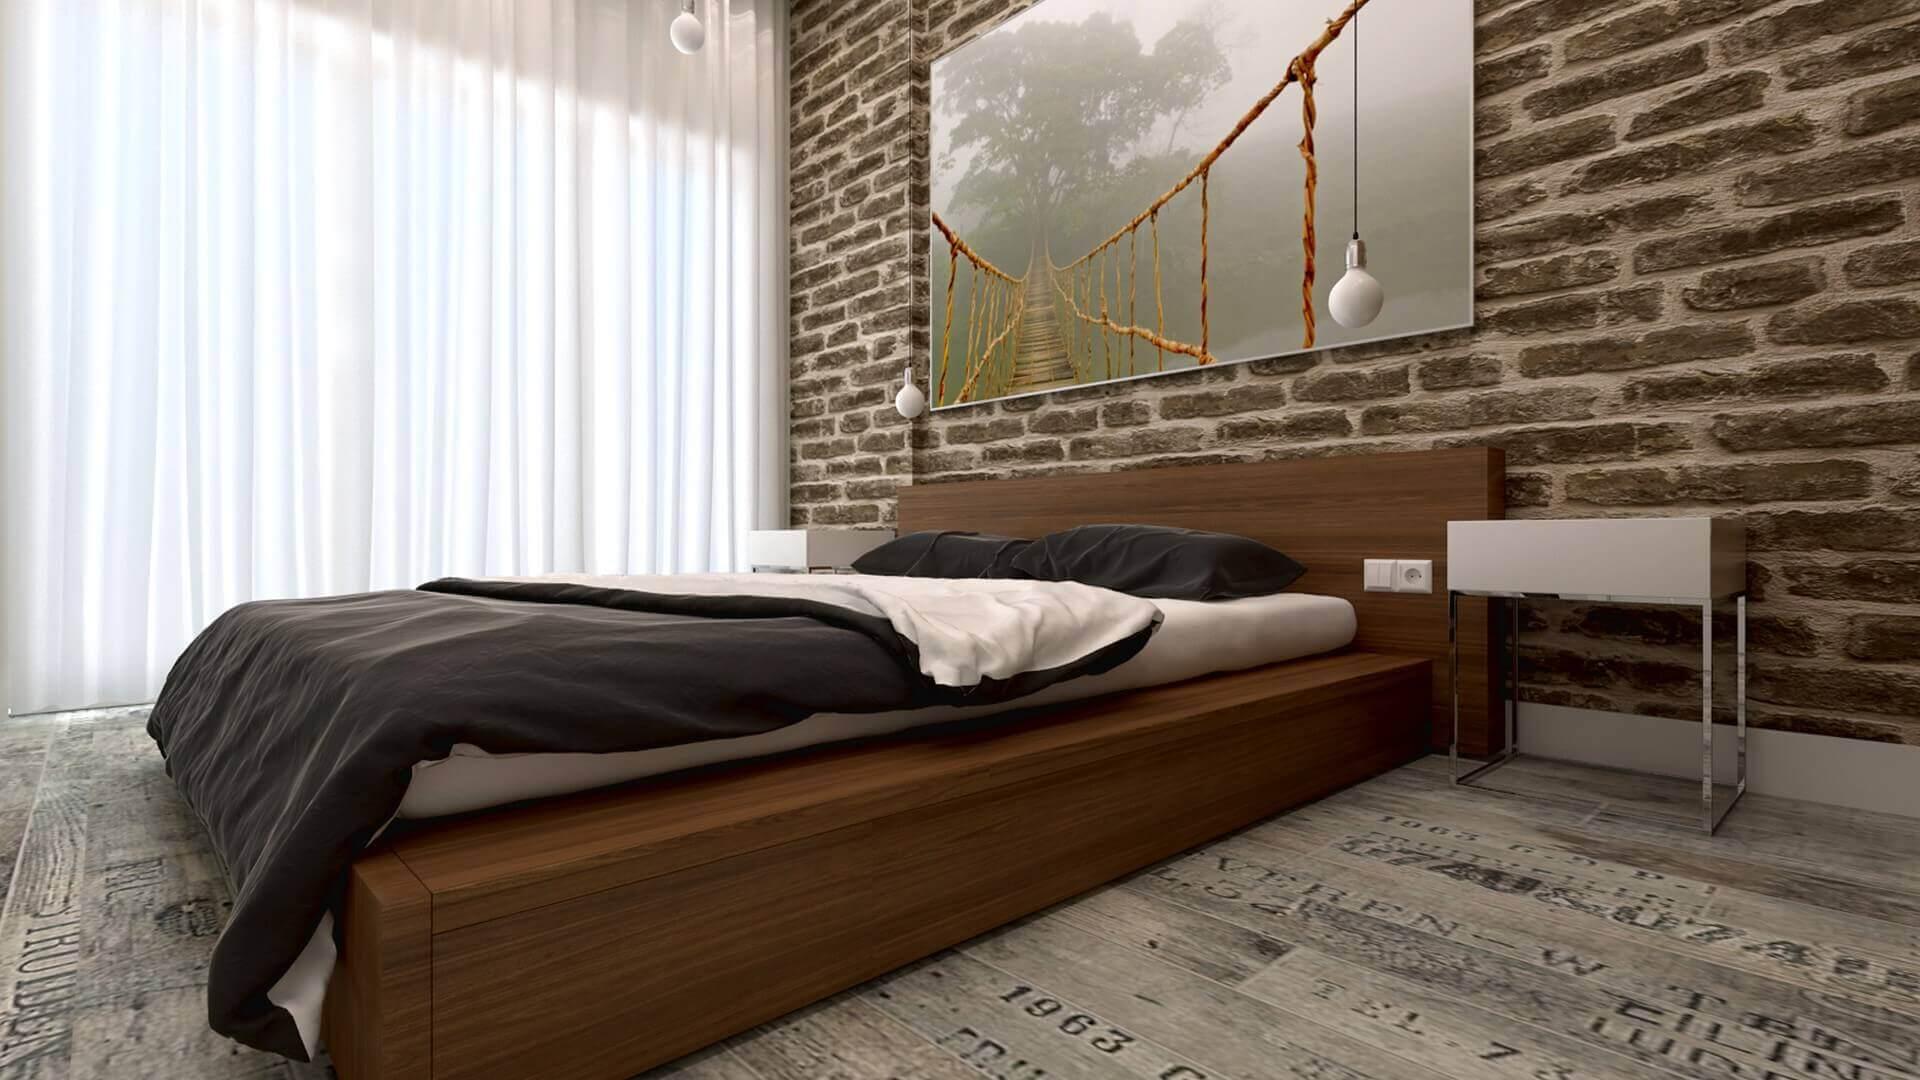 Sinpaş Altınoran 3199 D. Aslan Flat Residential